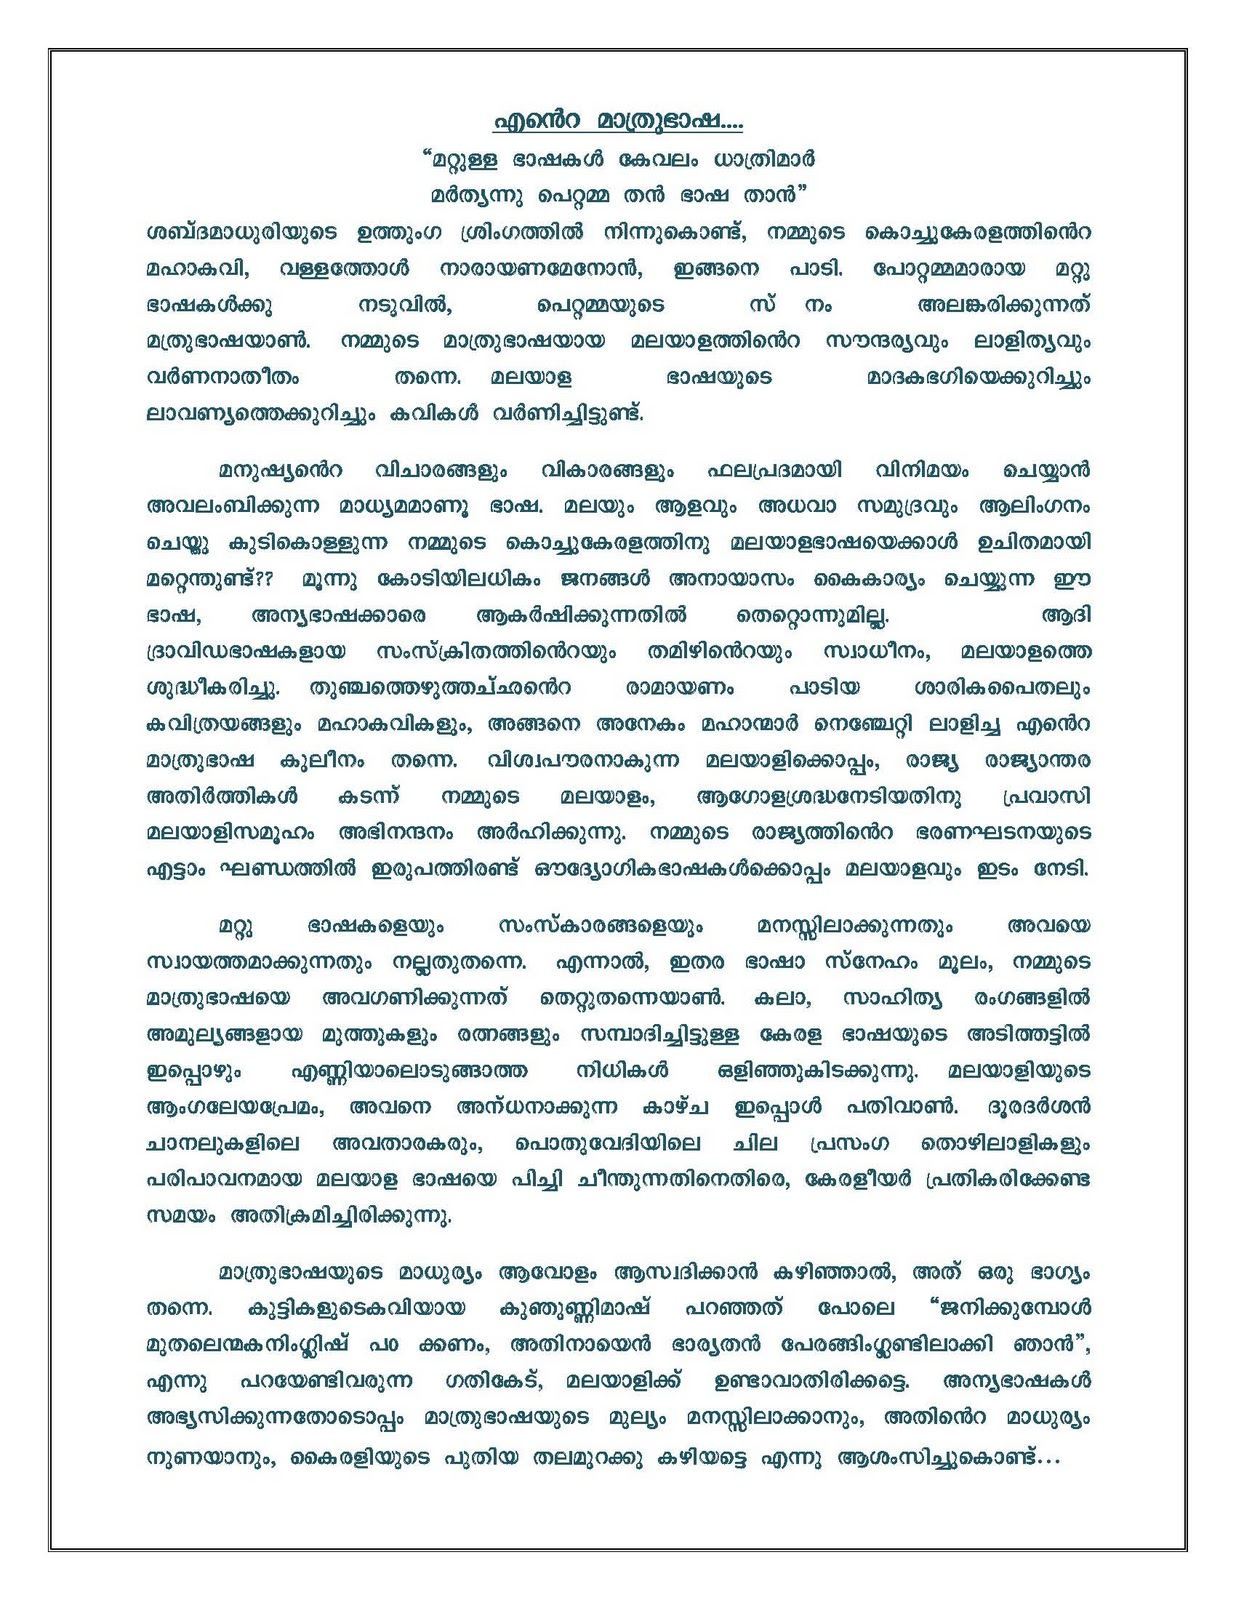 Malayalam essay on keralam 2010